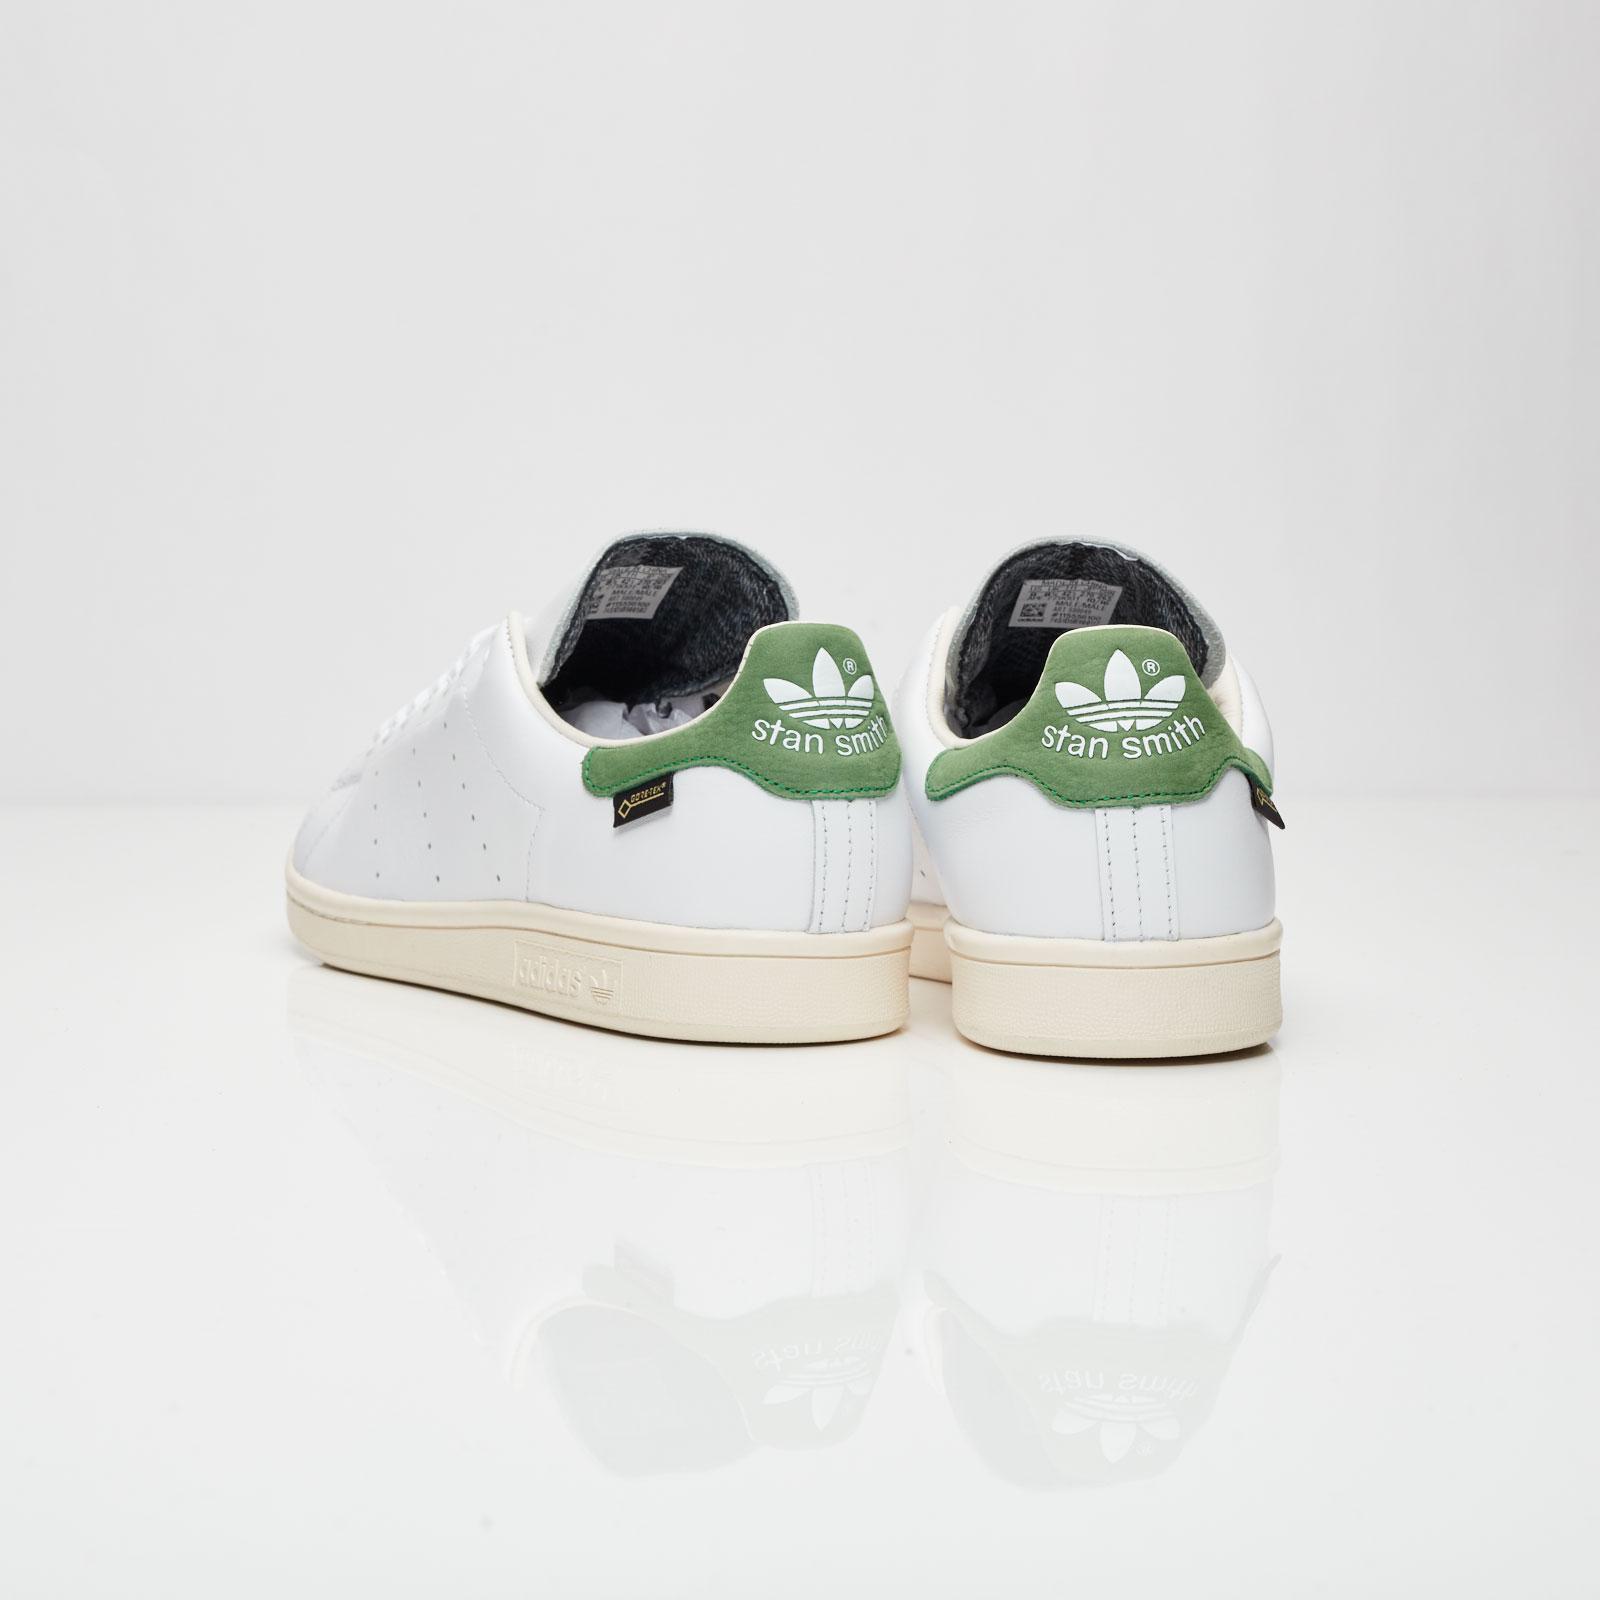 adidas Stan Smith GTX S80049 Sneakersnstuff | sneakers